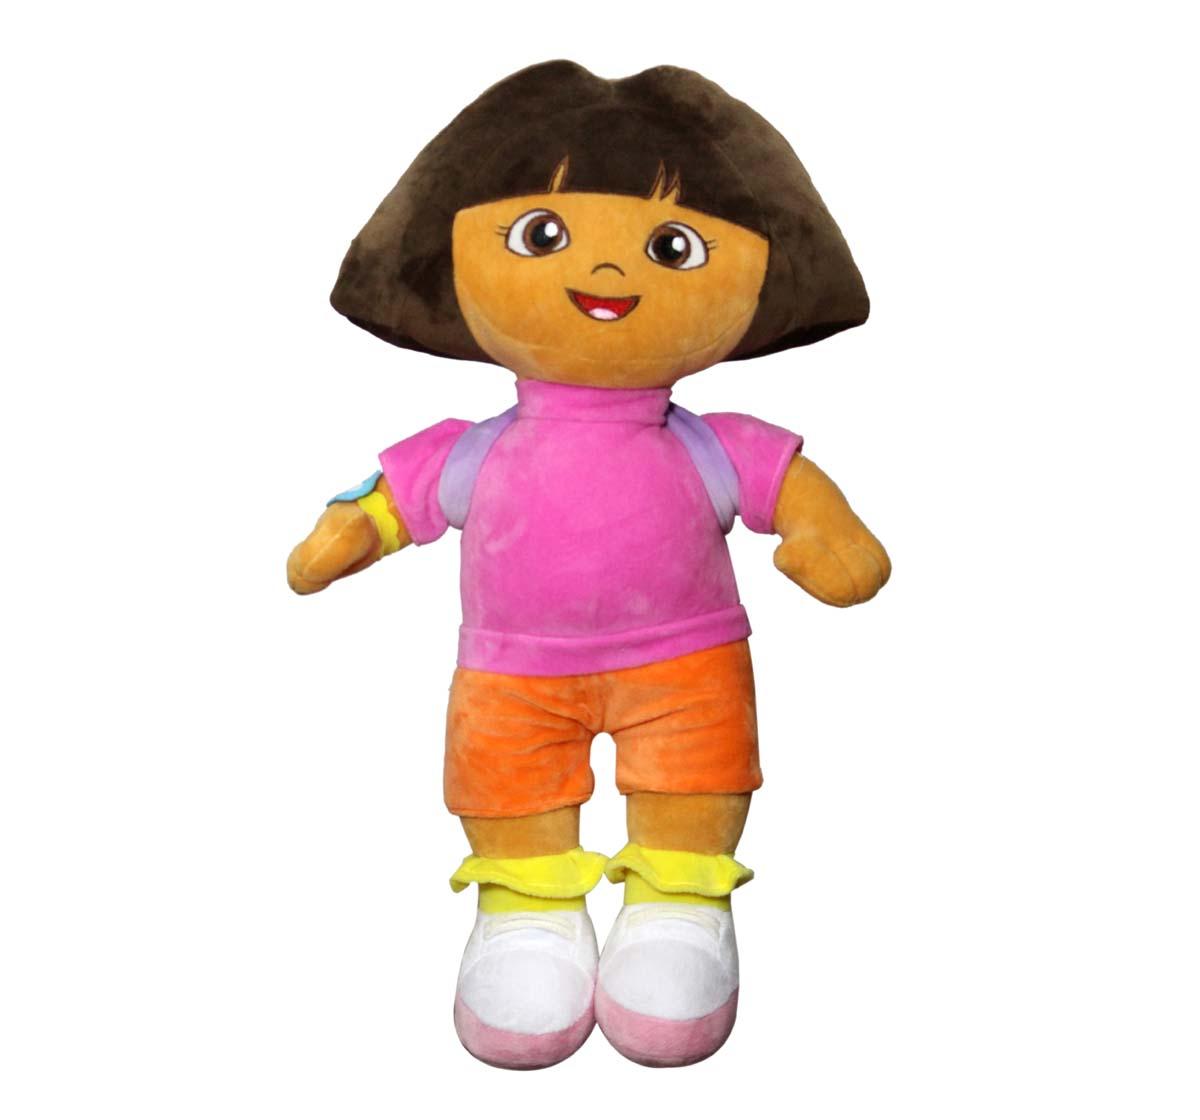 Dora The Explorer | Dora Soft Toy Character Doll for Kids age 12M+ 40.64 Cm